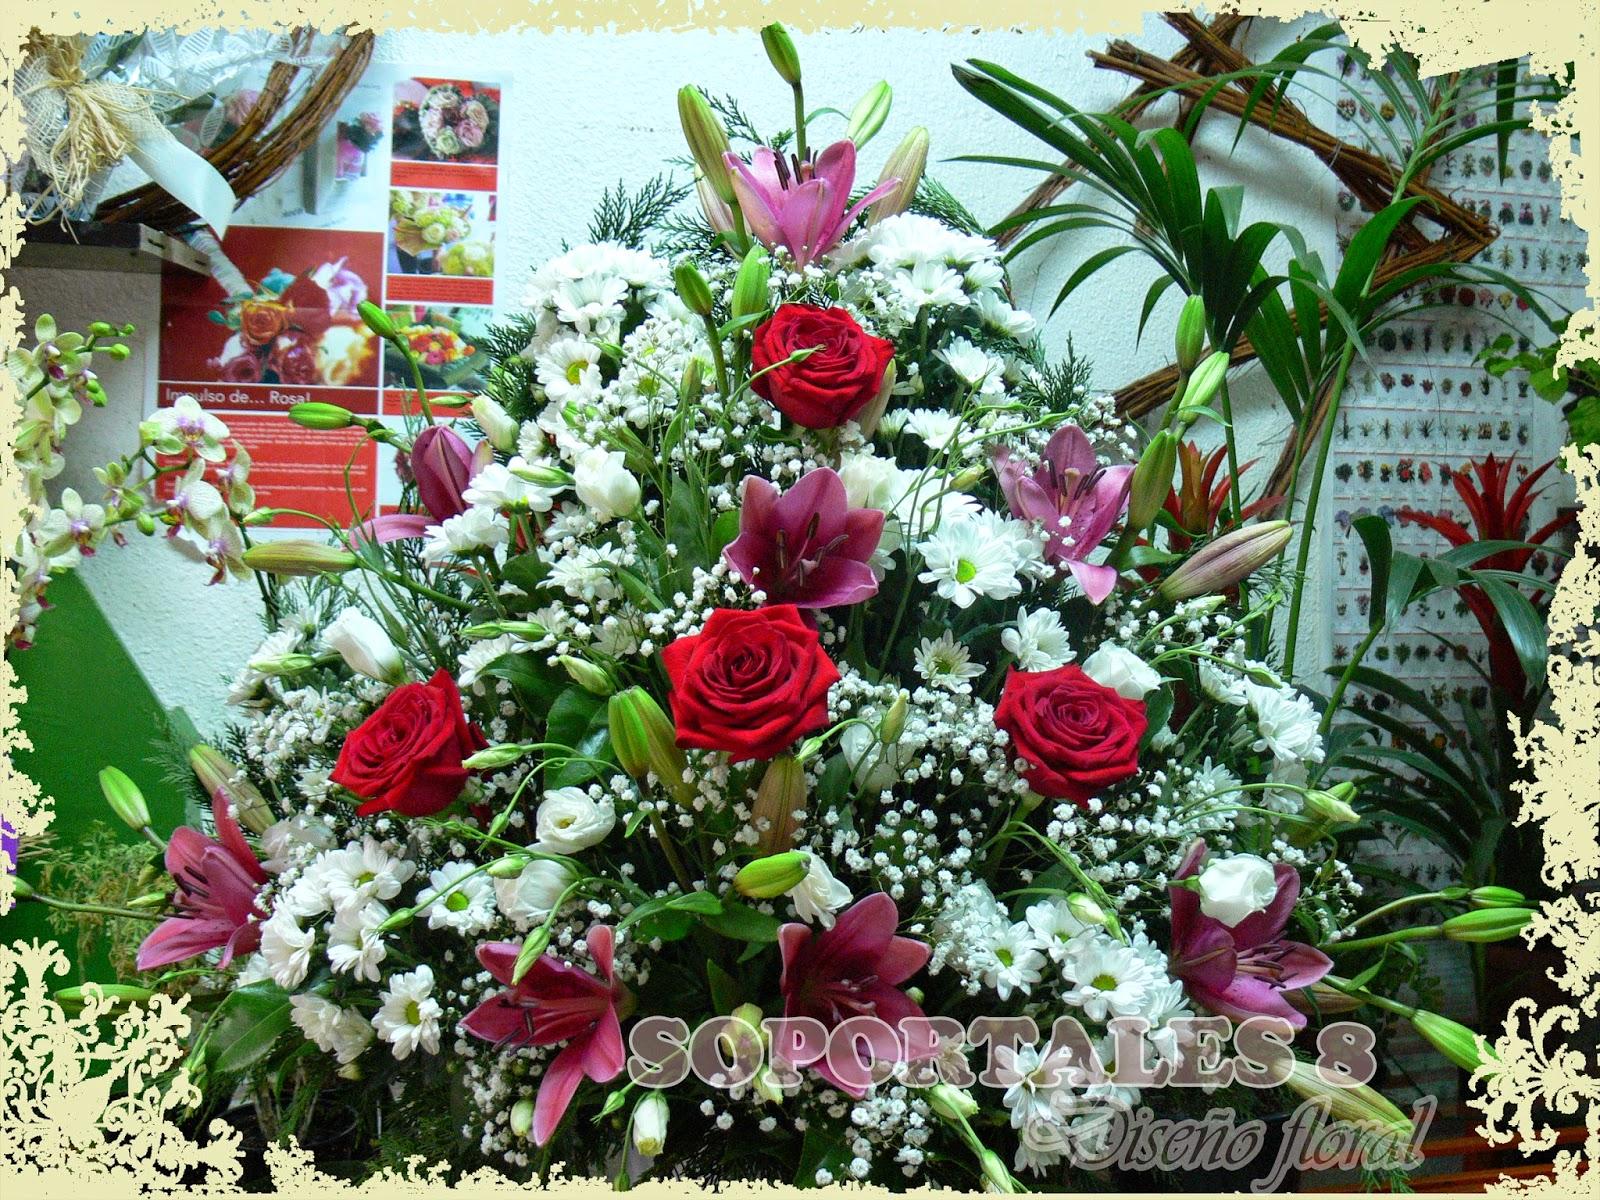 Fotos De Ramos De Flores Grandes. Flores De Color Prpura